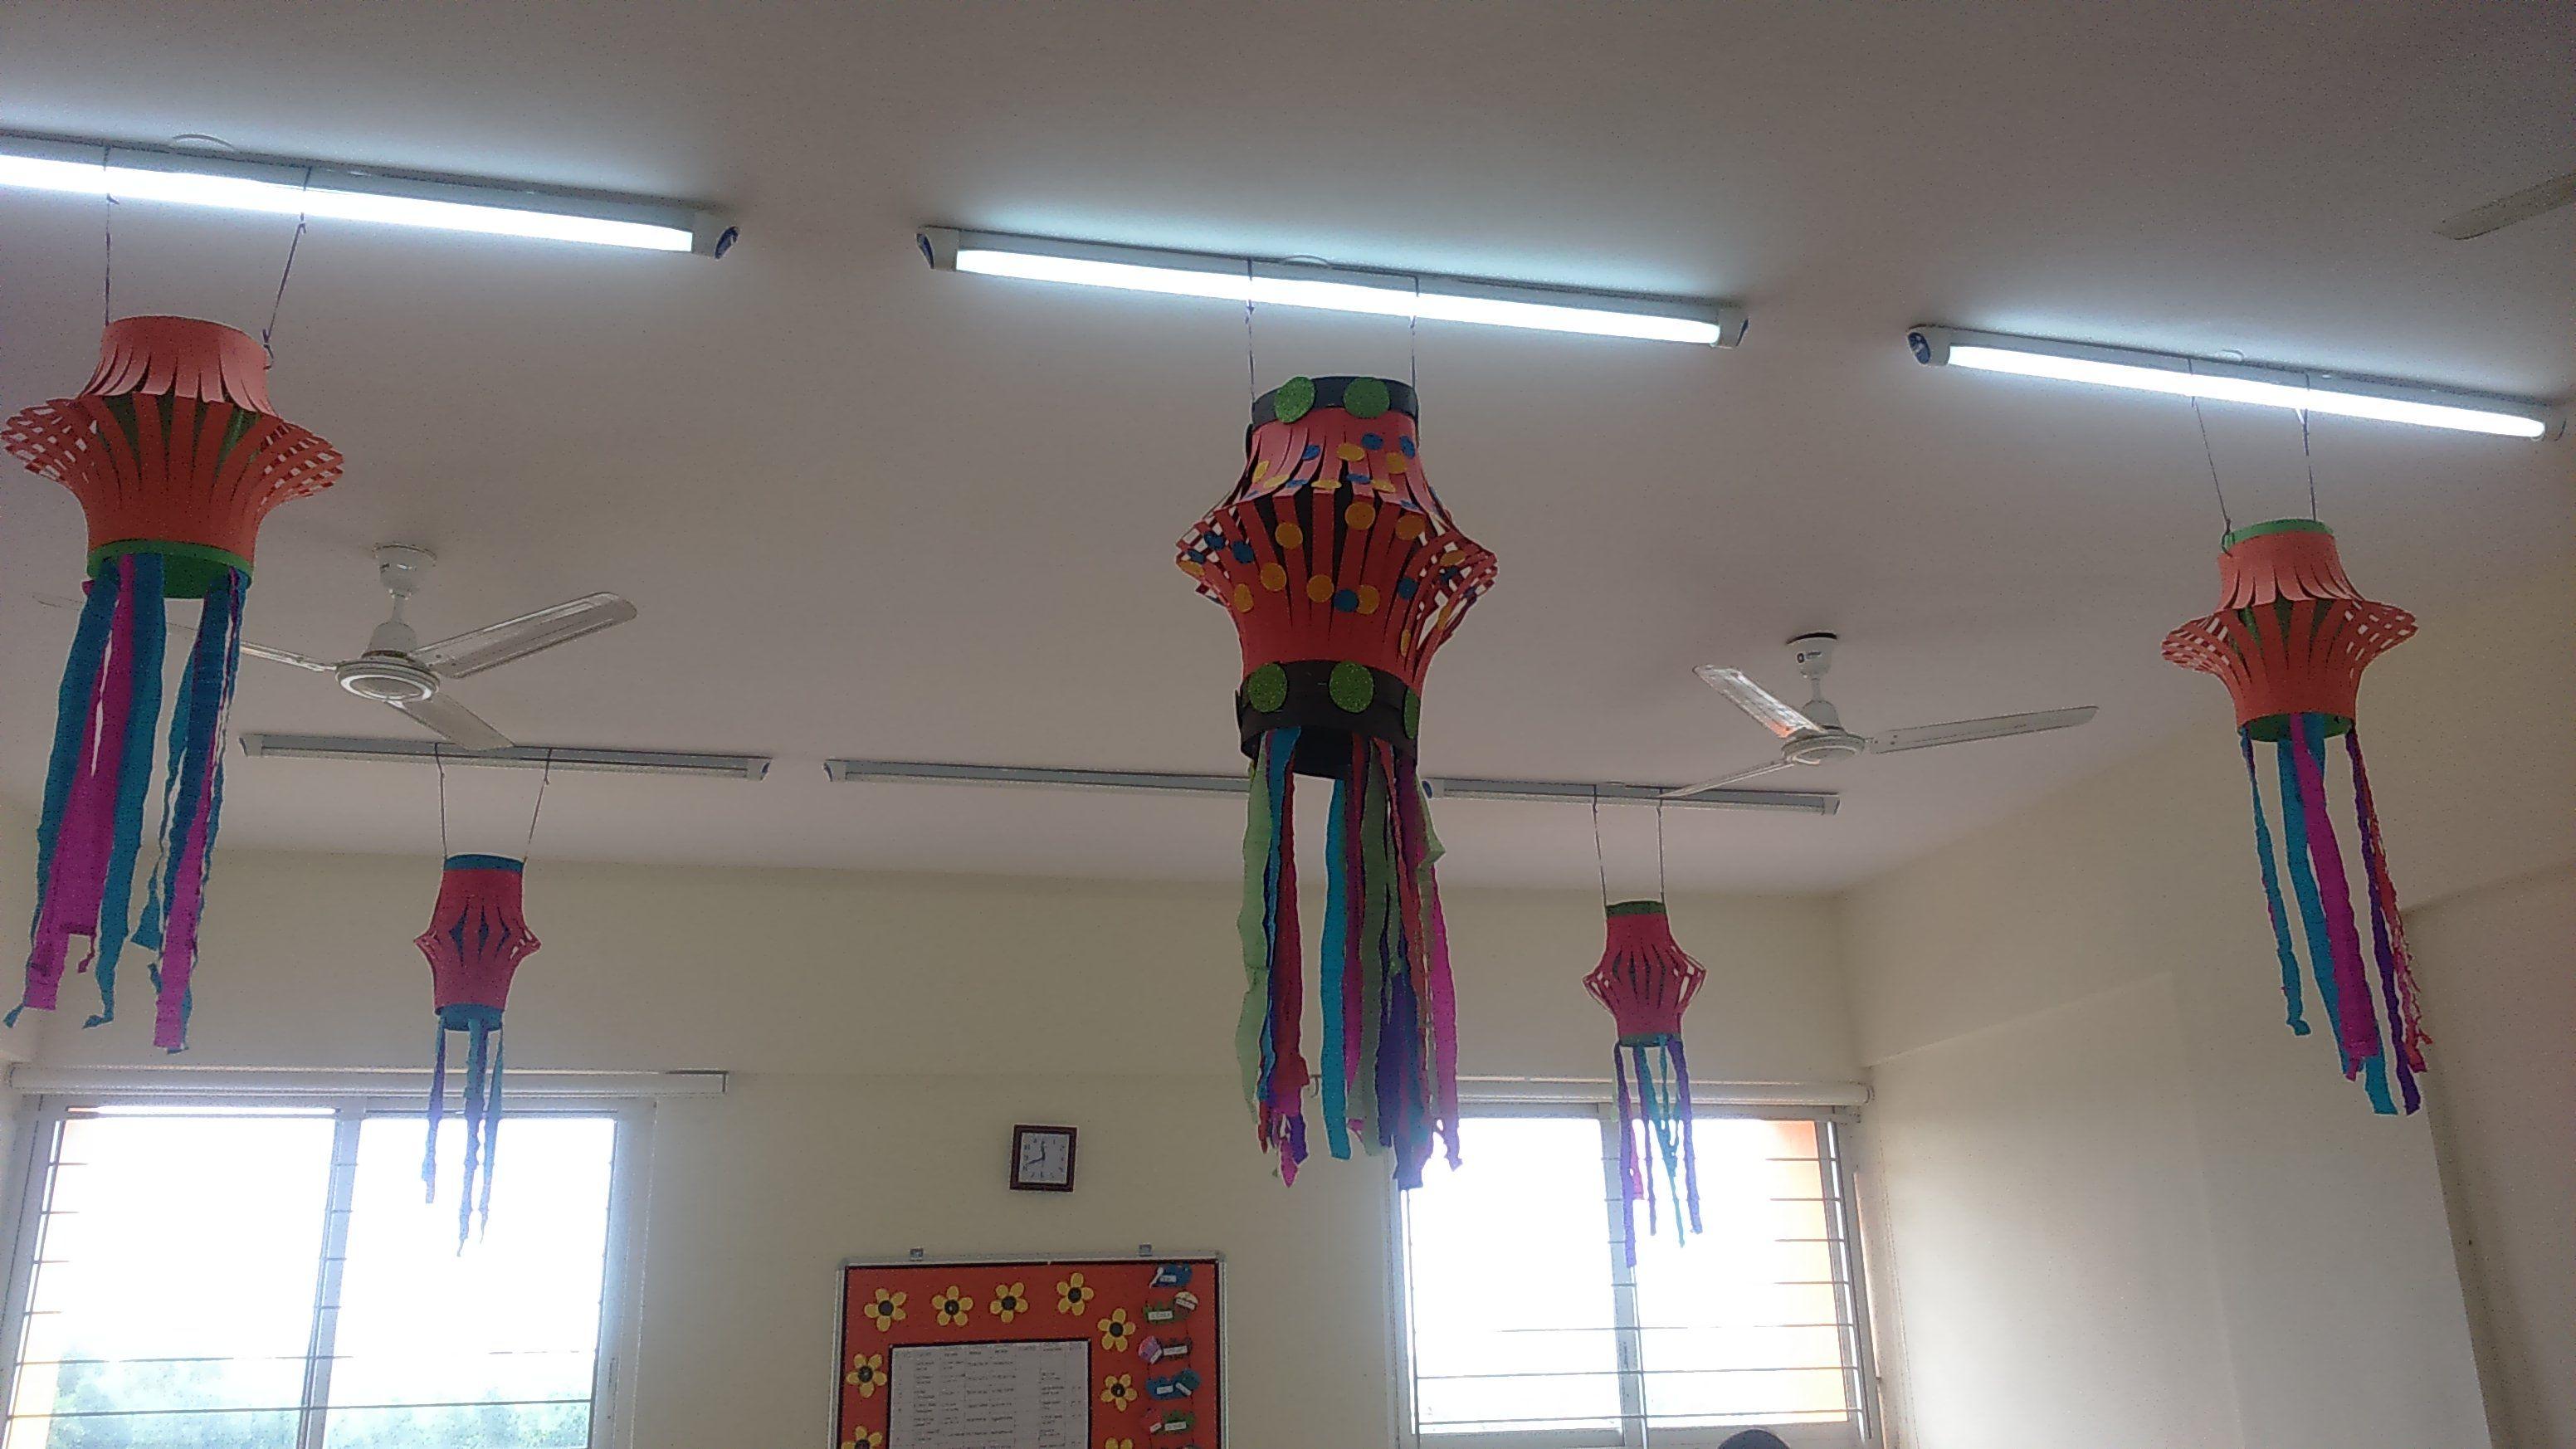 Classroom Door Decoration Ideas For Diwali ~ Lkg class decoration for diwali creative classroom